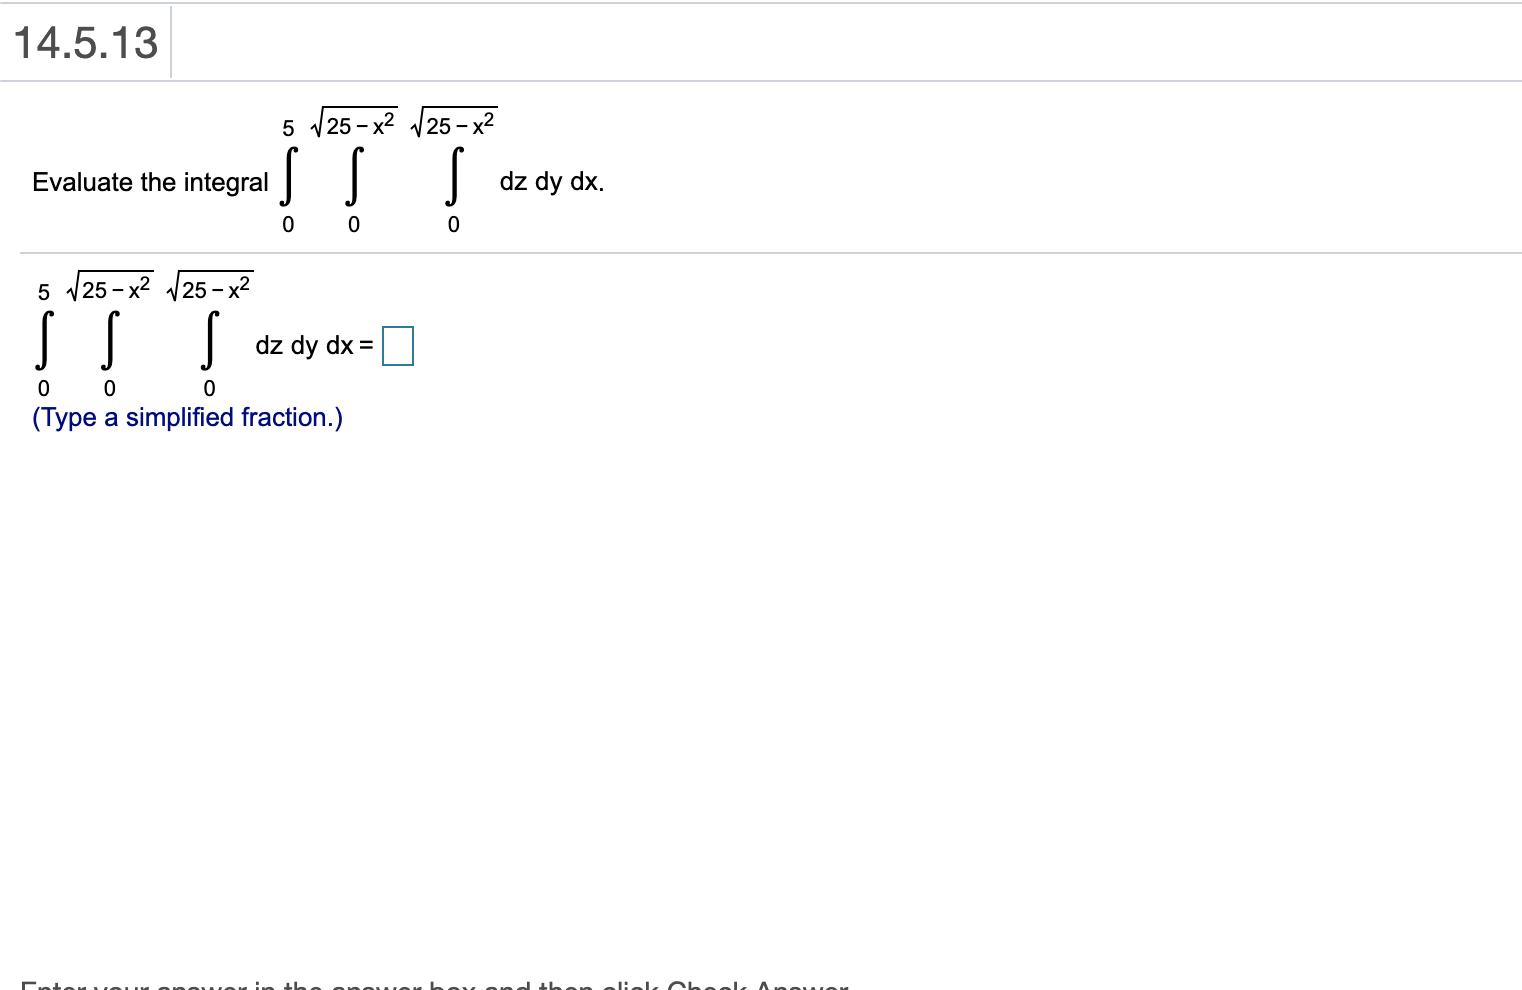 14.5.13 5 125 – x2 25 - x2 Evaluate the integrals Il s dz dy dx. 0 0 0 5 V25 - x? 125 – x2 s s dz dy dx = 0 0 (Type a simplif